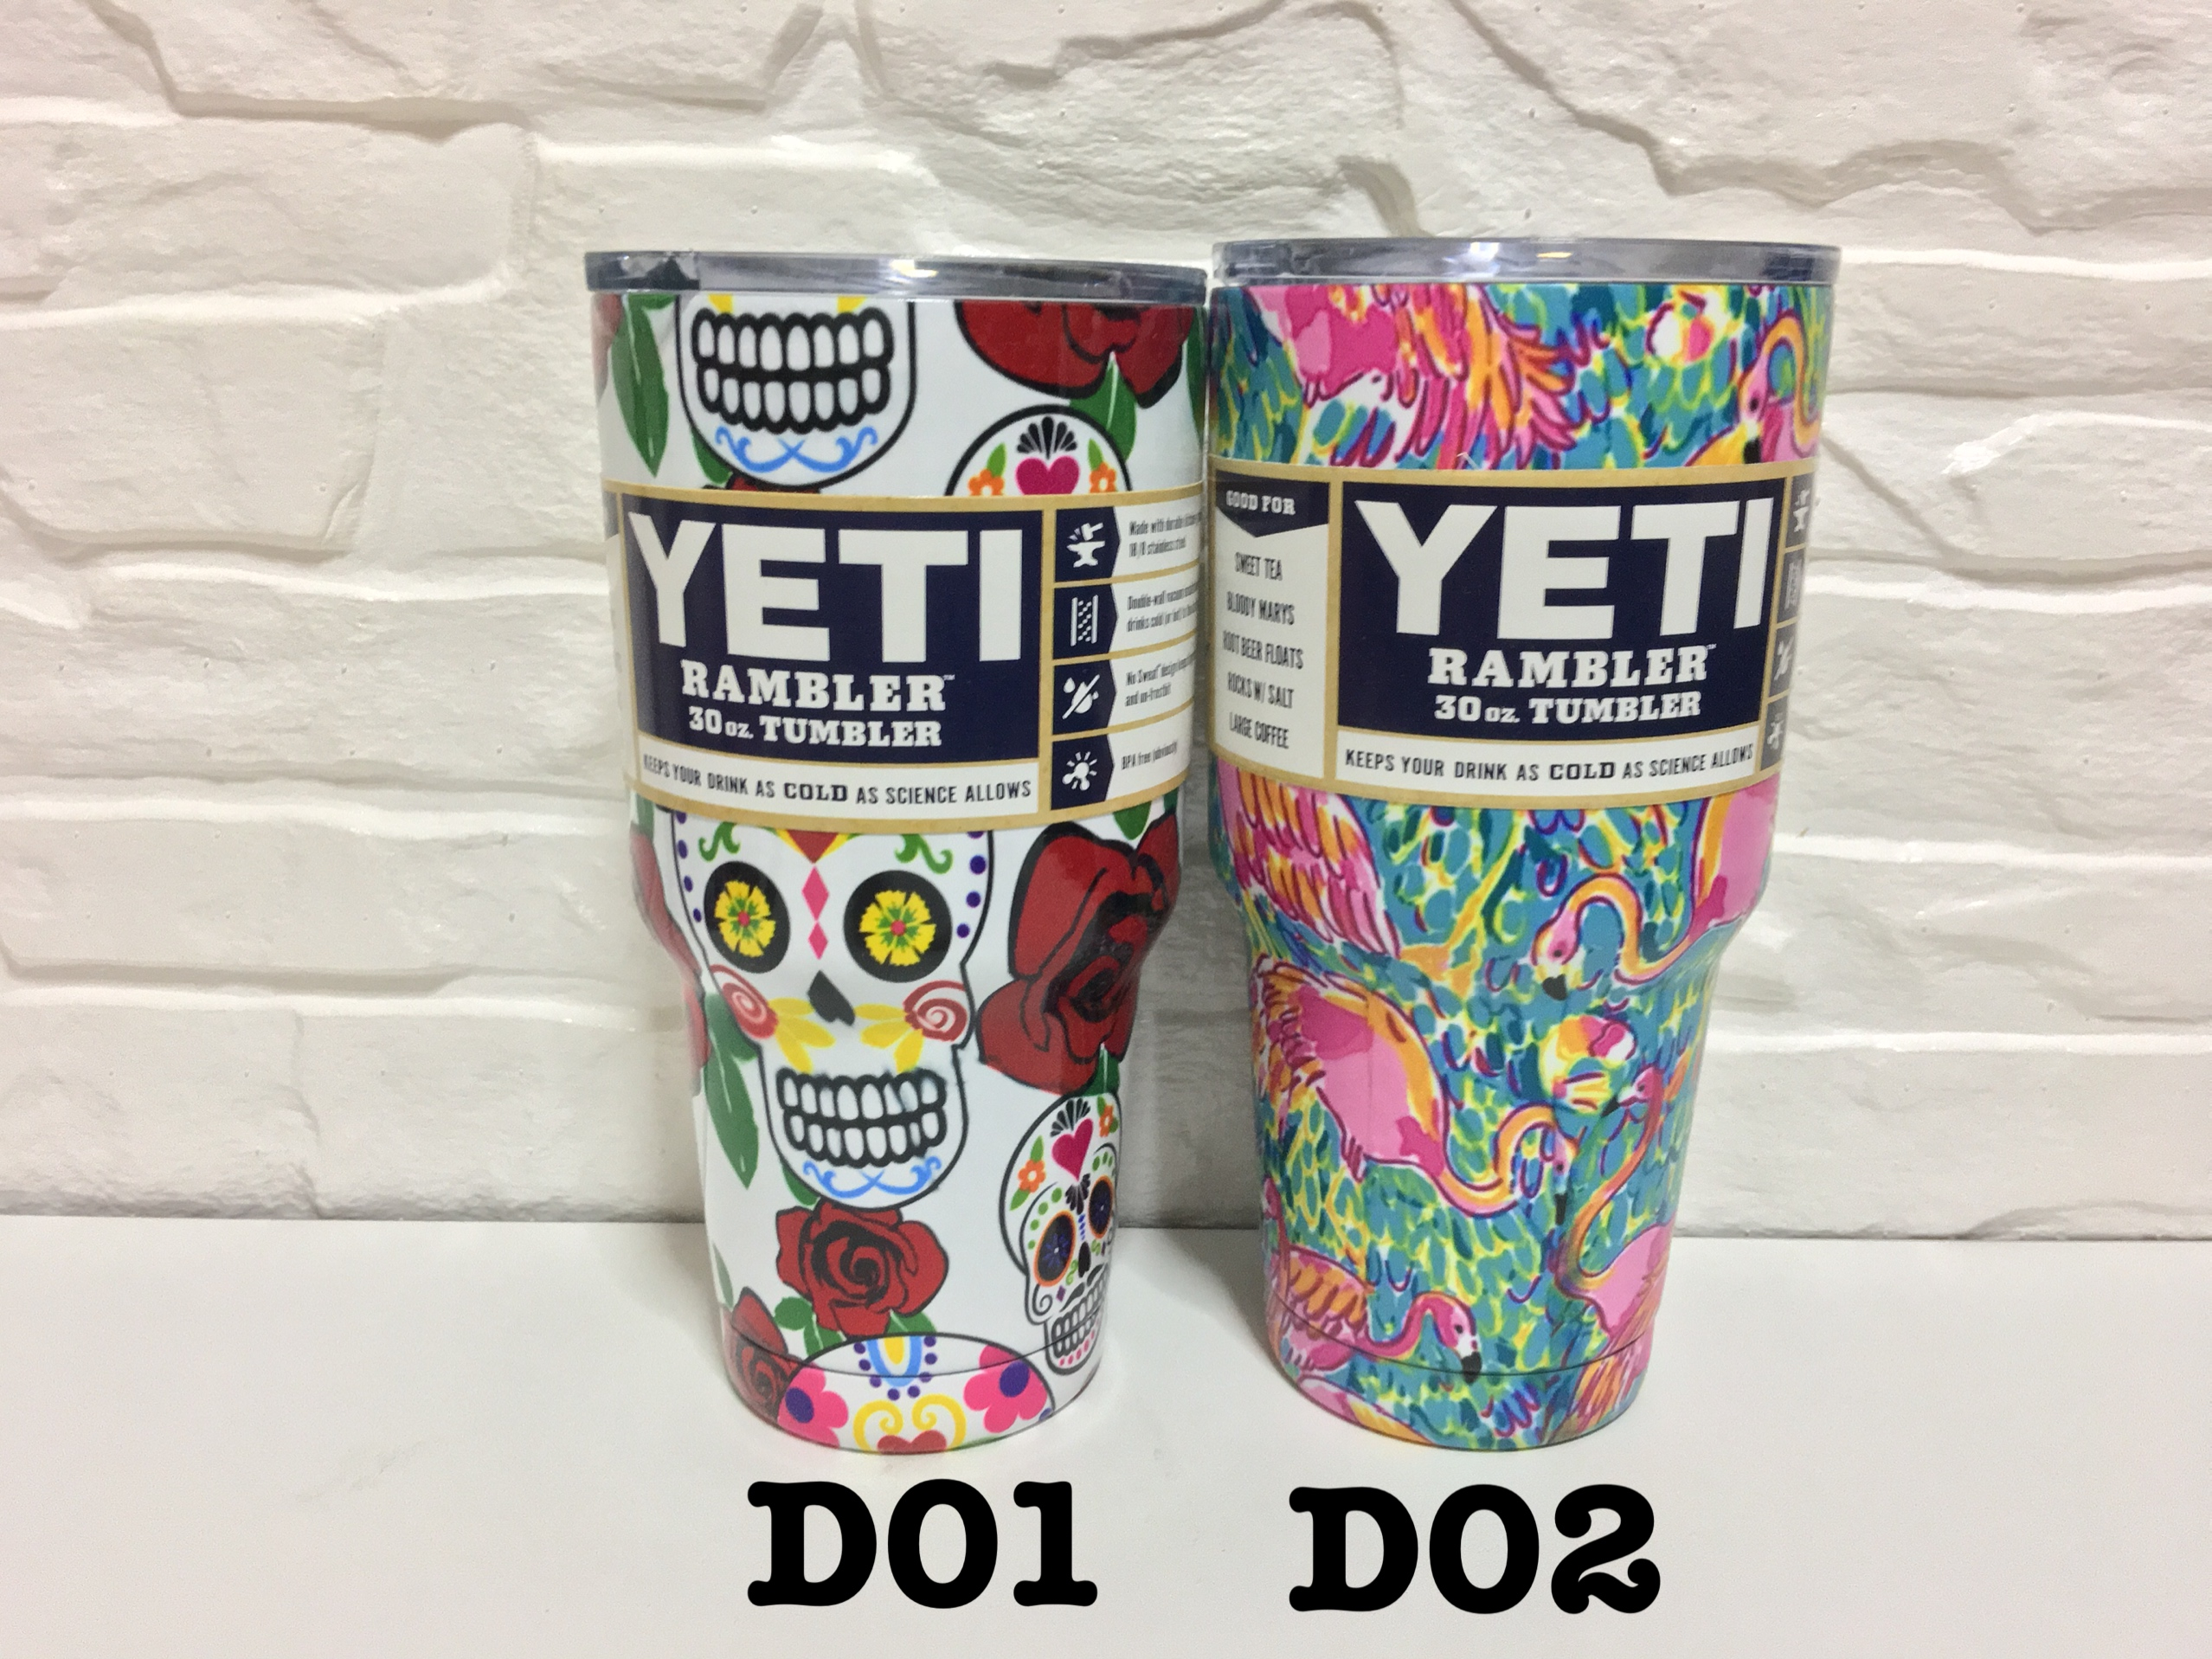 YETI Rambler แก้วเก็บความเย็น เก็บน้ำแข็ง 30 oz Model D